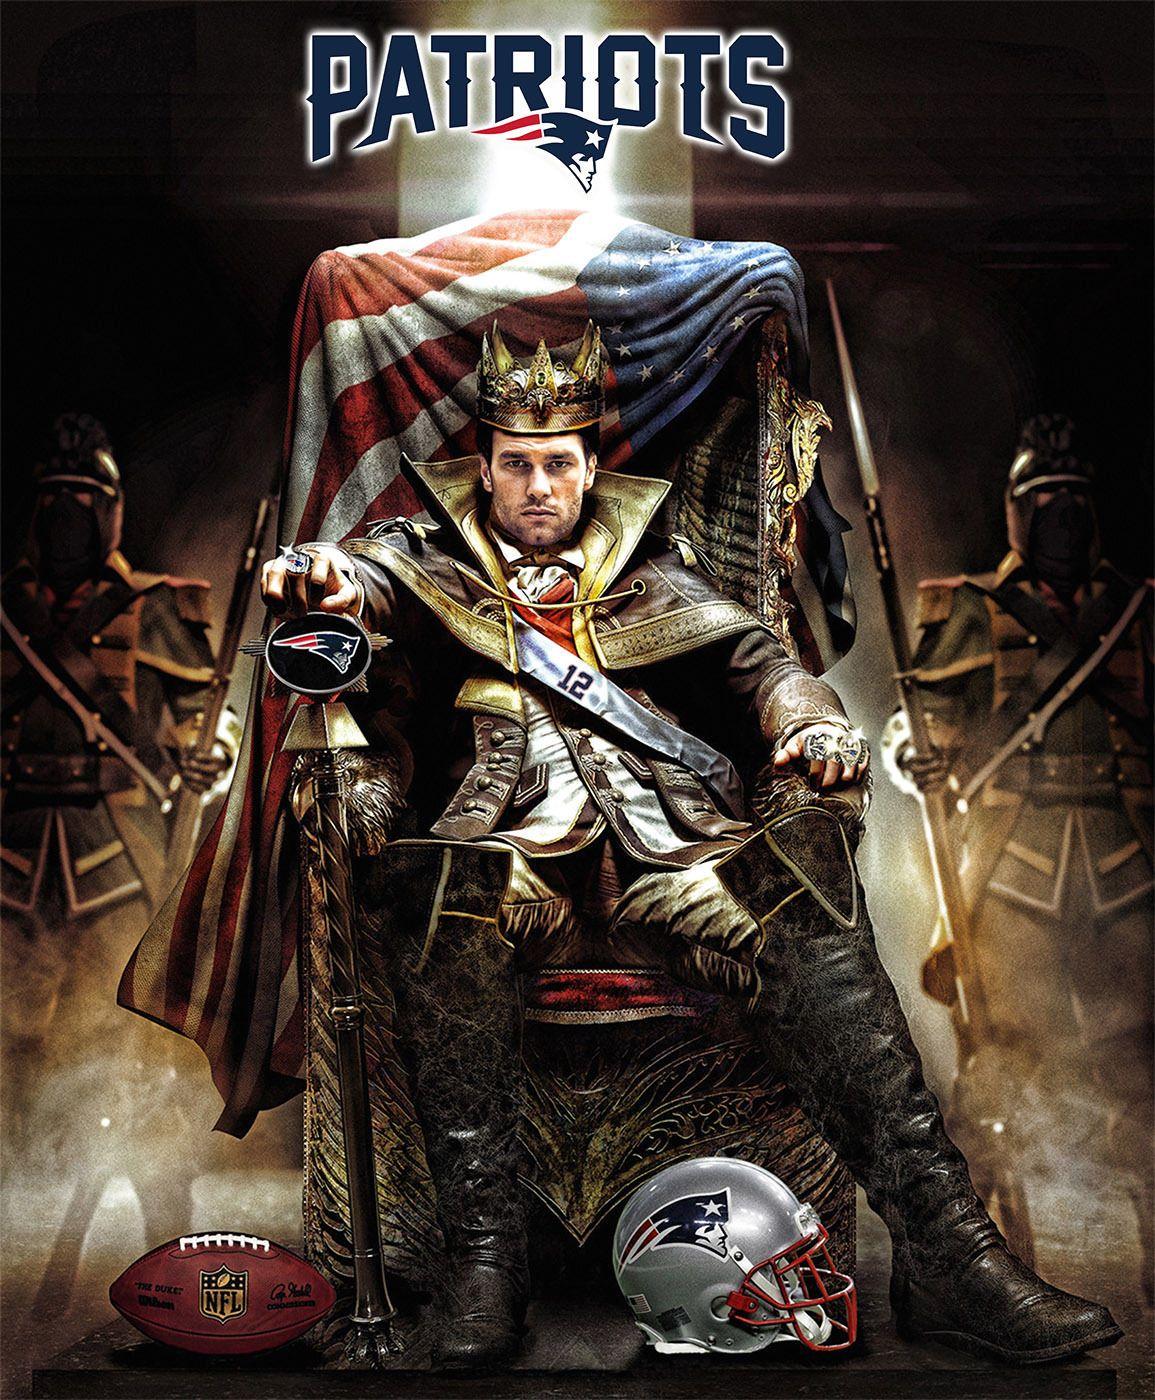 Tom Brady Game Of Thrones American Patriot New England Patriots 30 X24 Poster New England Patriots England Patriots Nfl New England Patriots